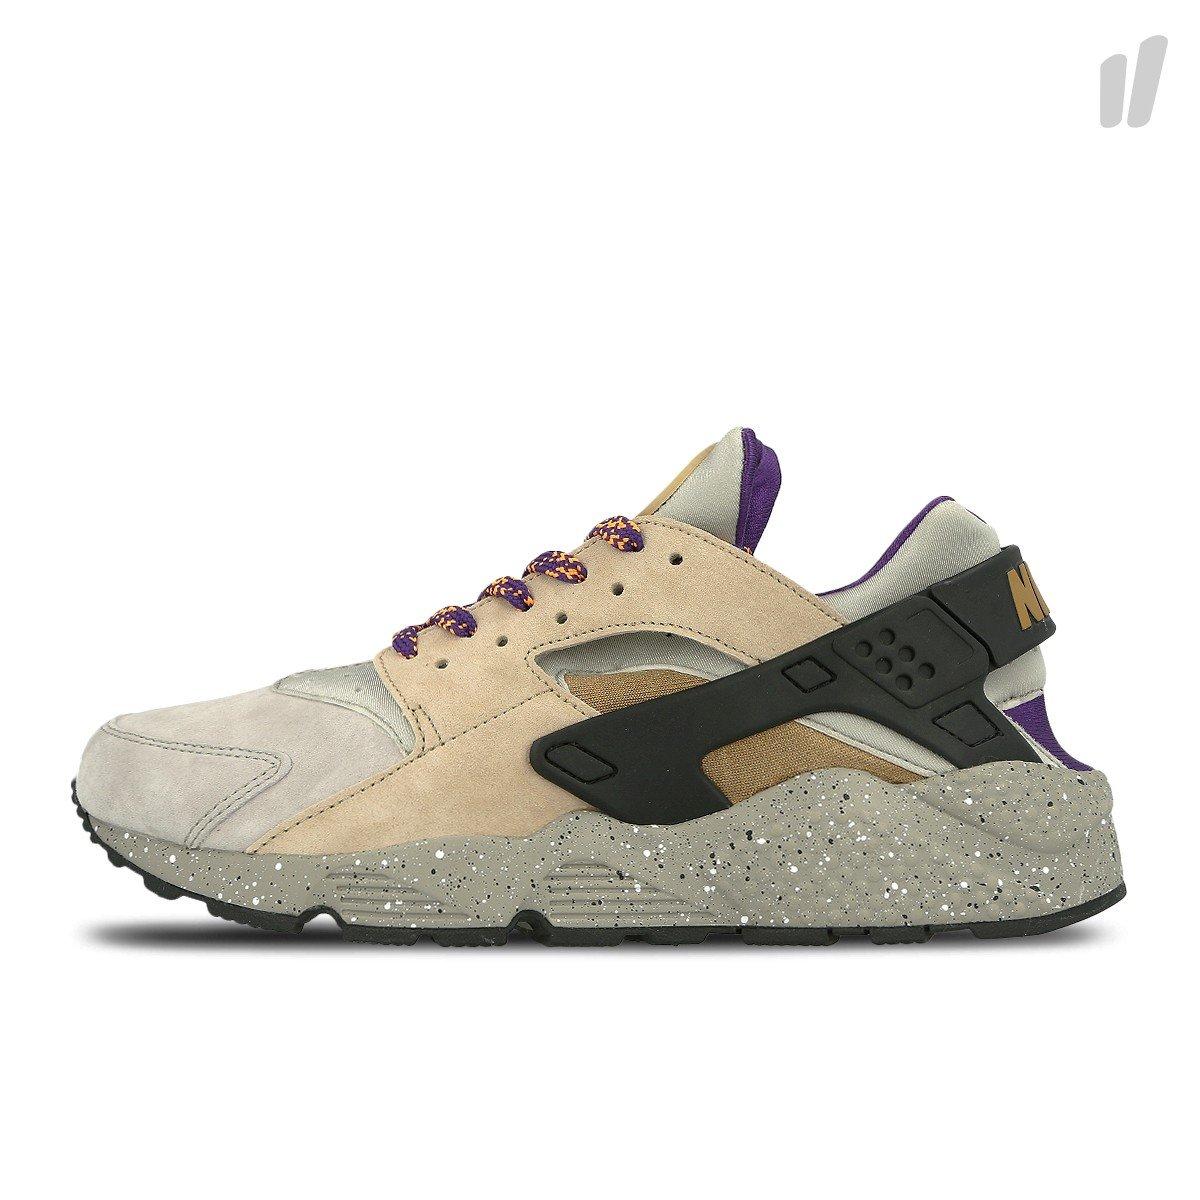 Nike Air Huarache Run PRM - 704830200 - Color Grey - Size: 9.0